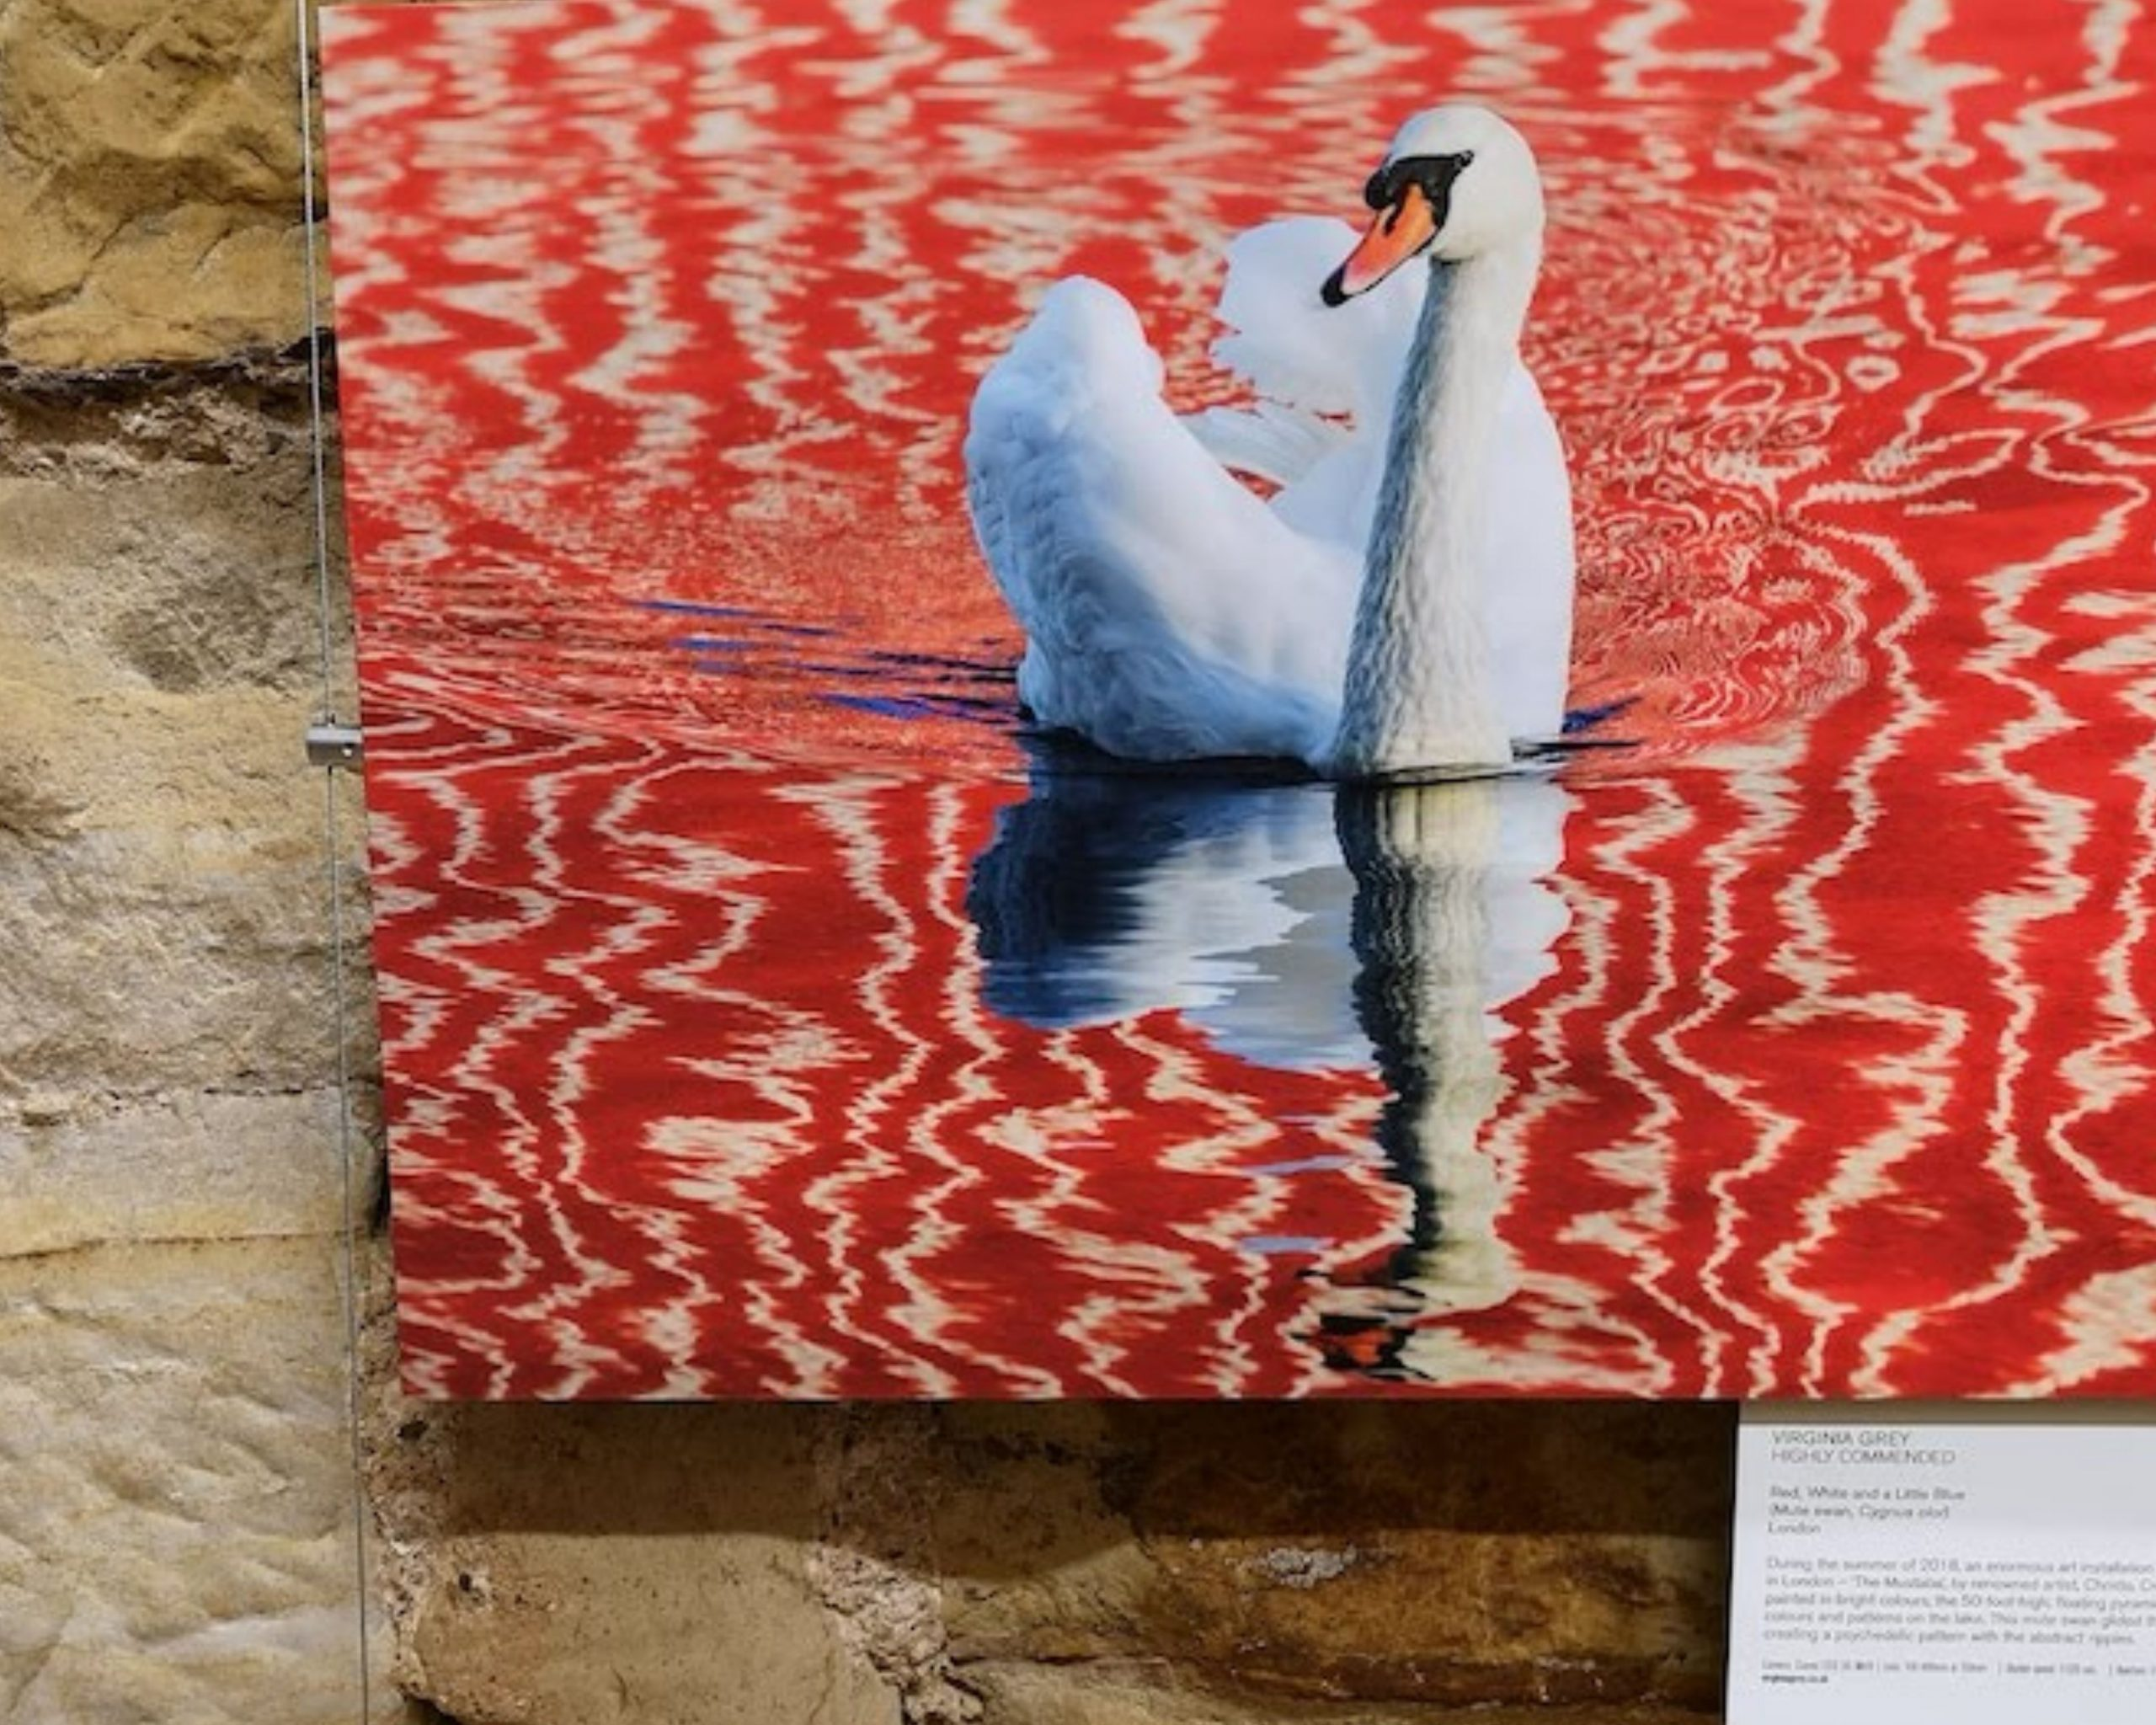 award-winning photography exhibition